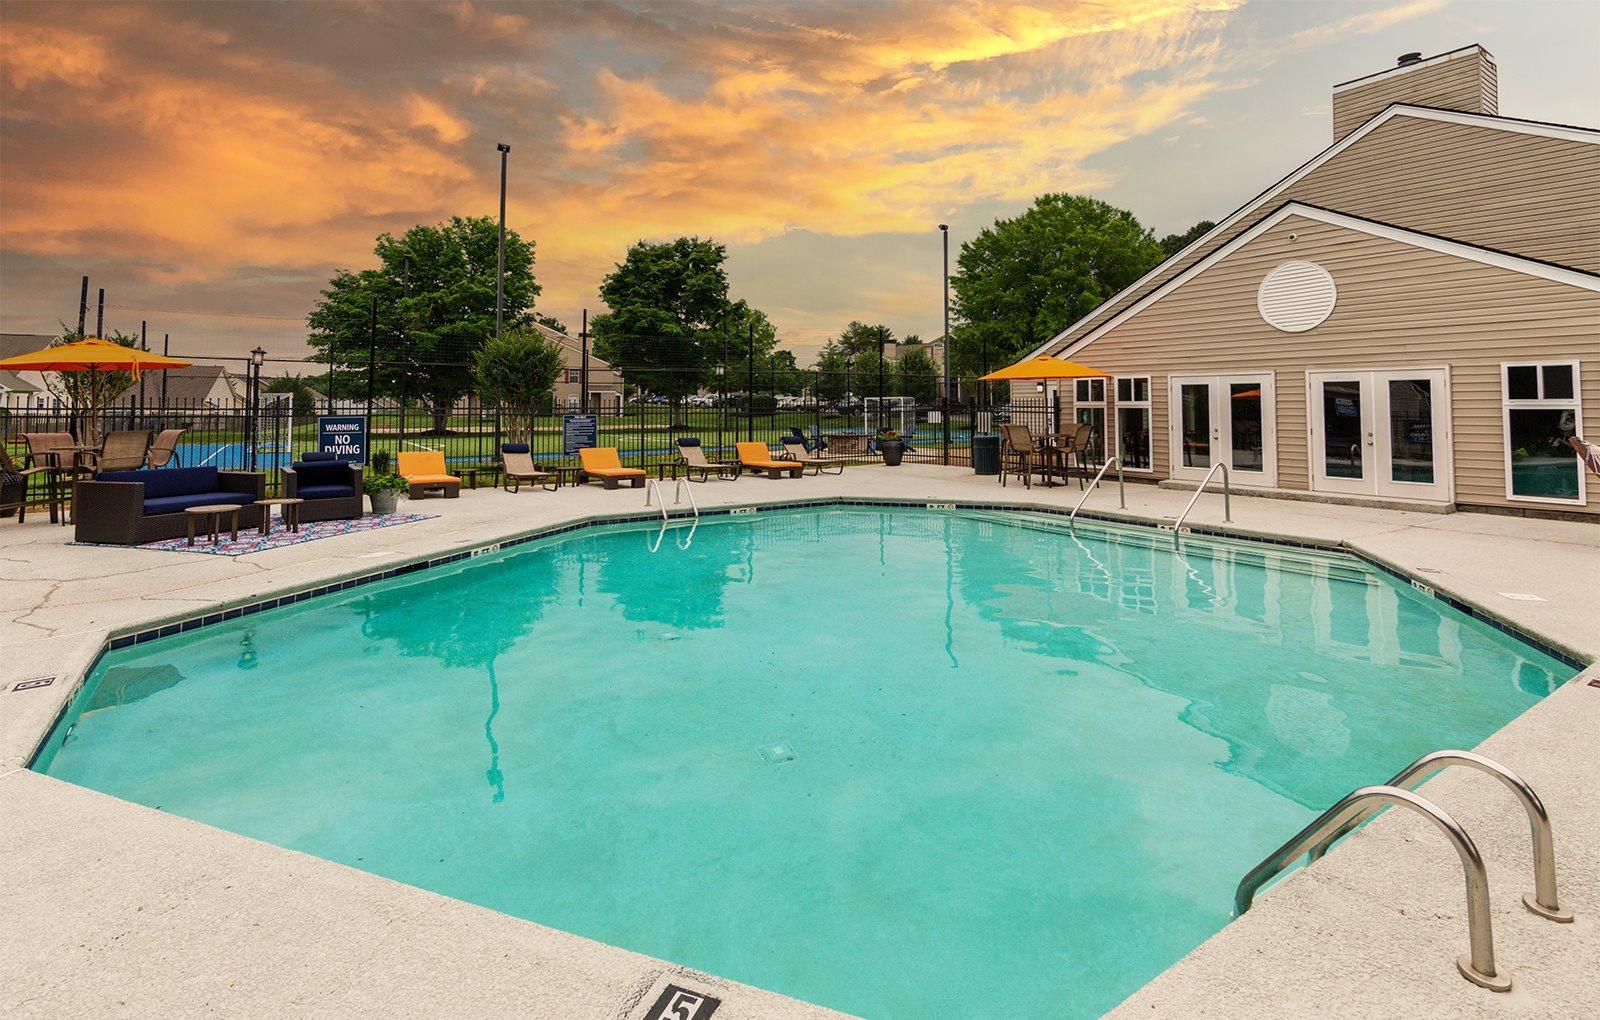 Priest Lake pool at sunset